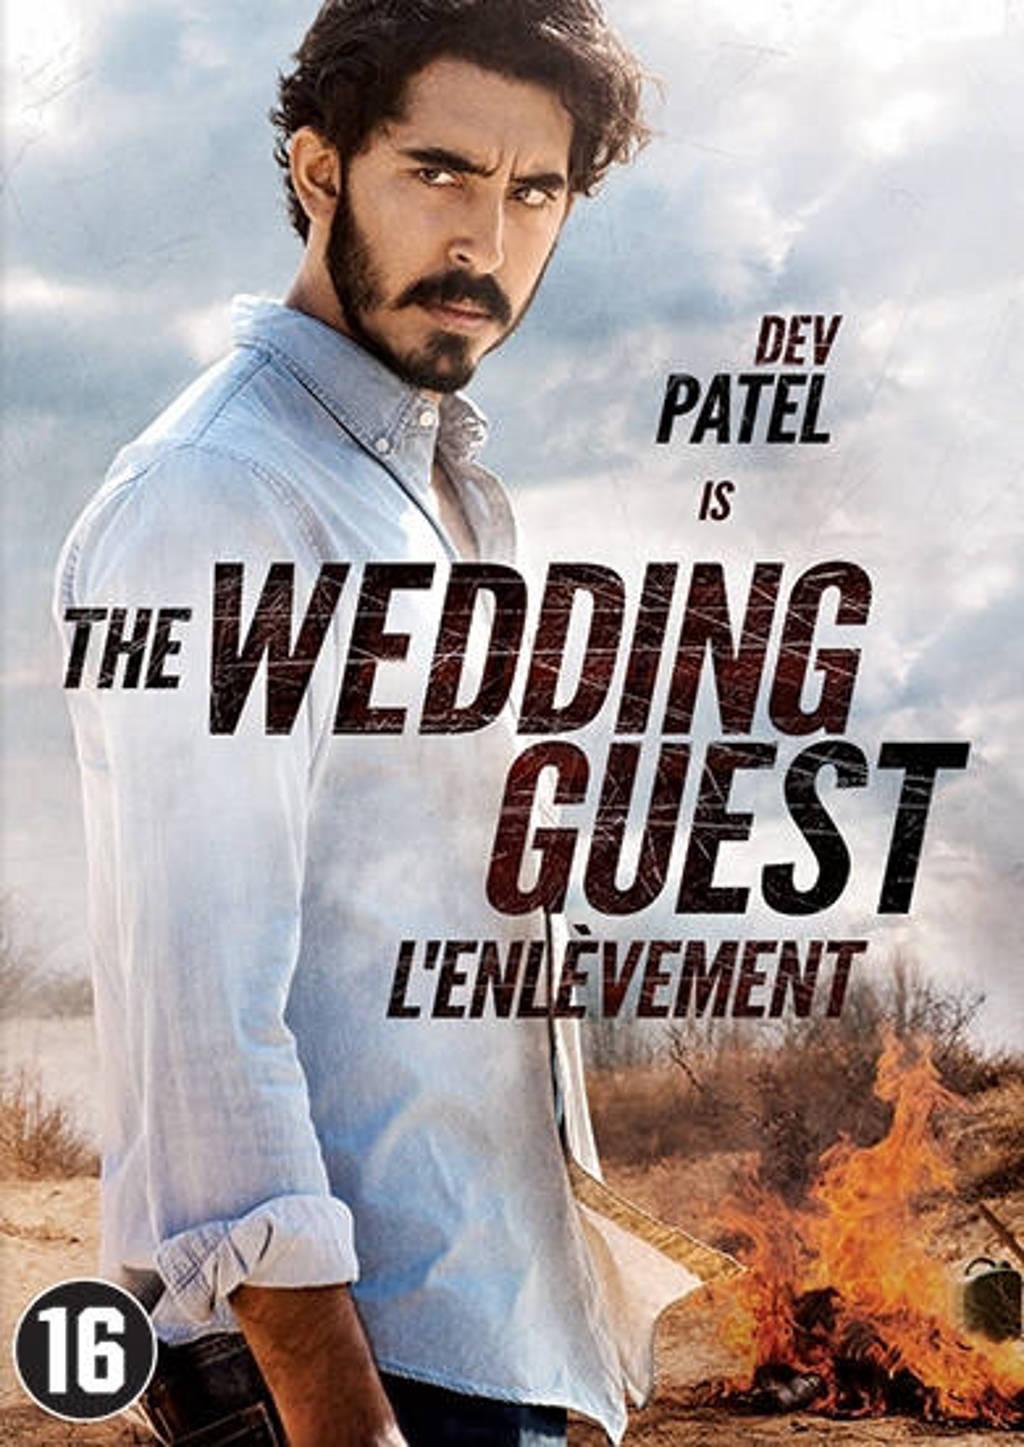 The wedding guest (DVD)